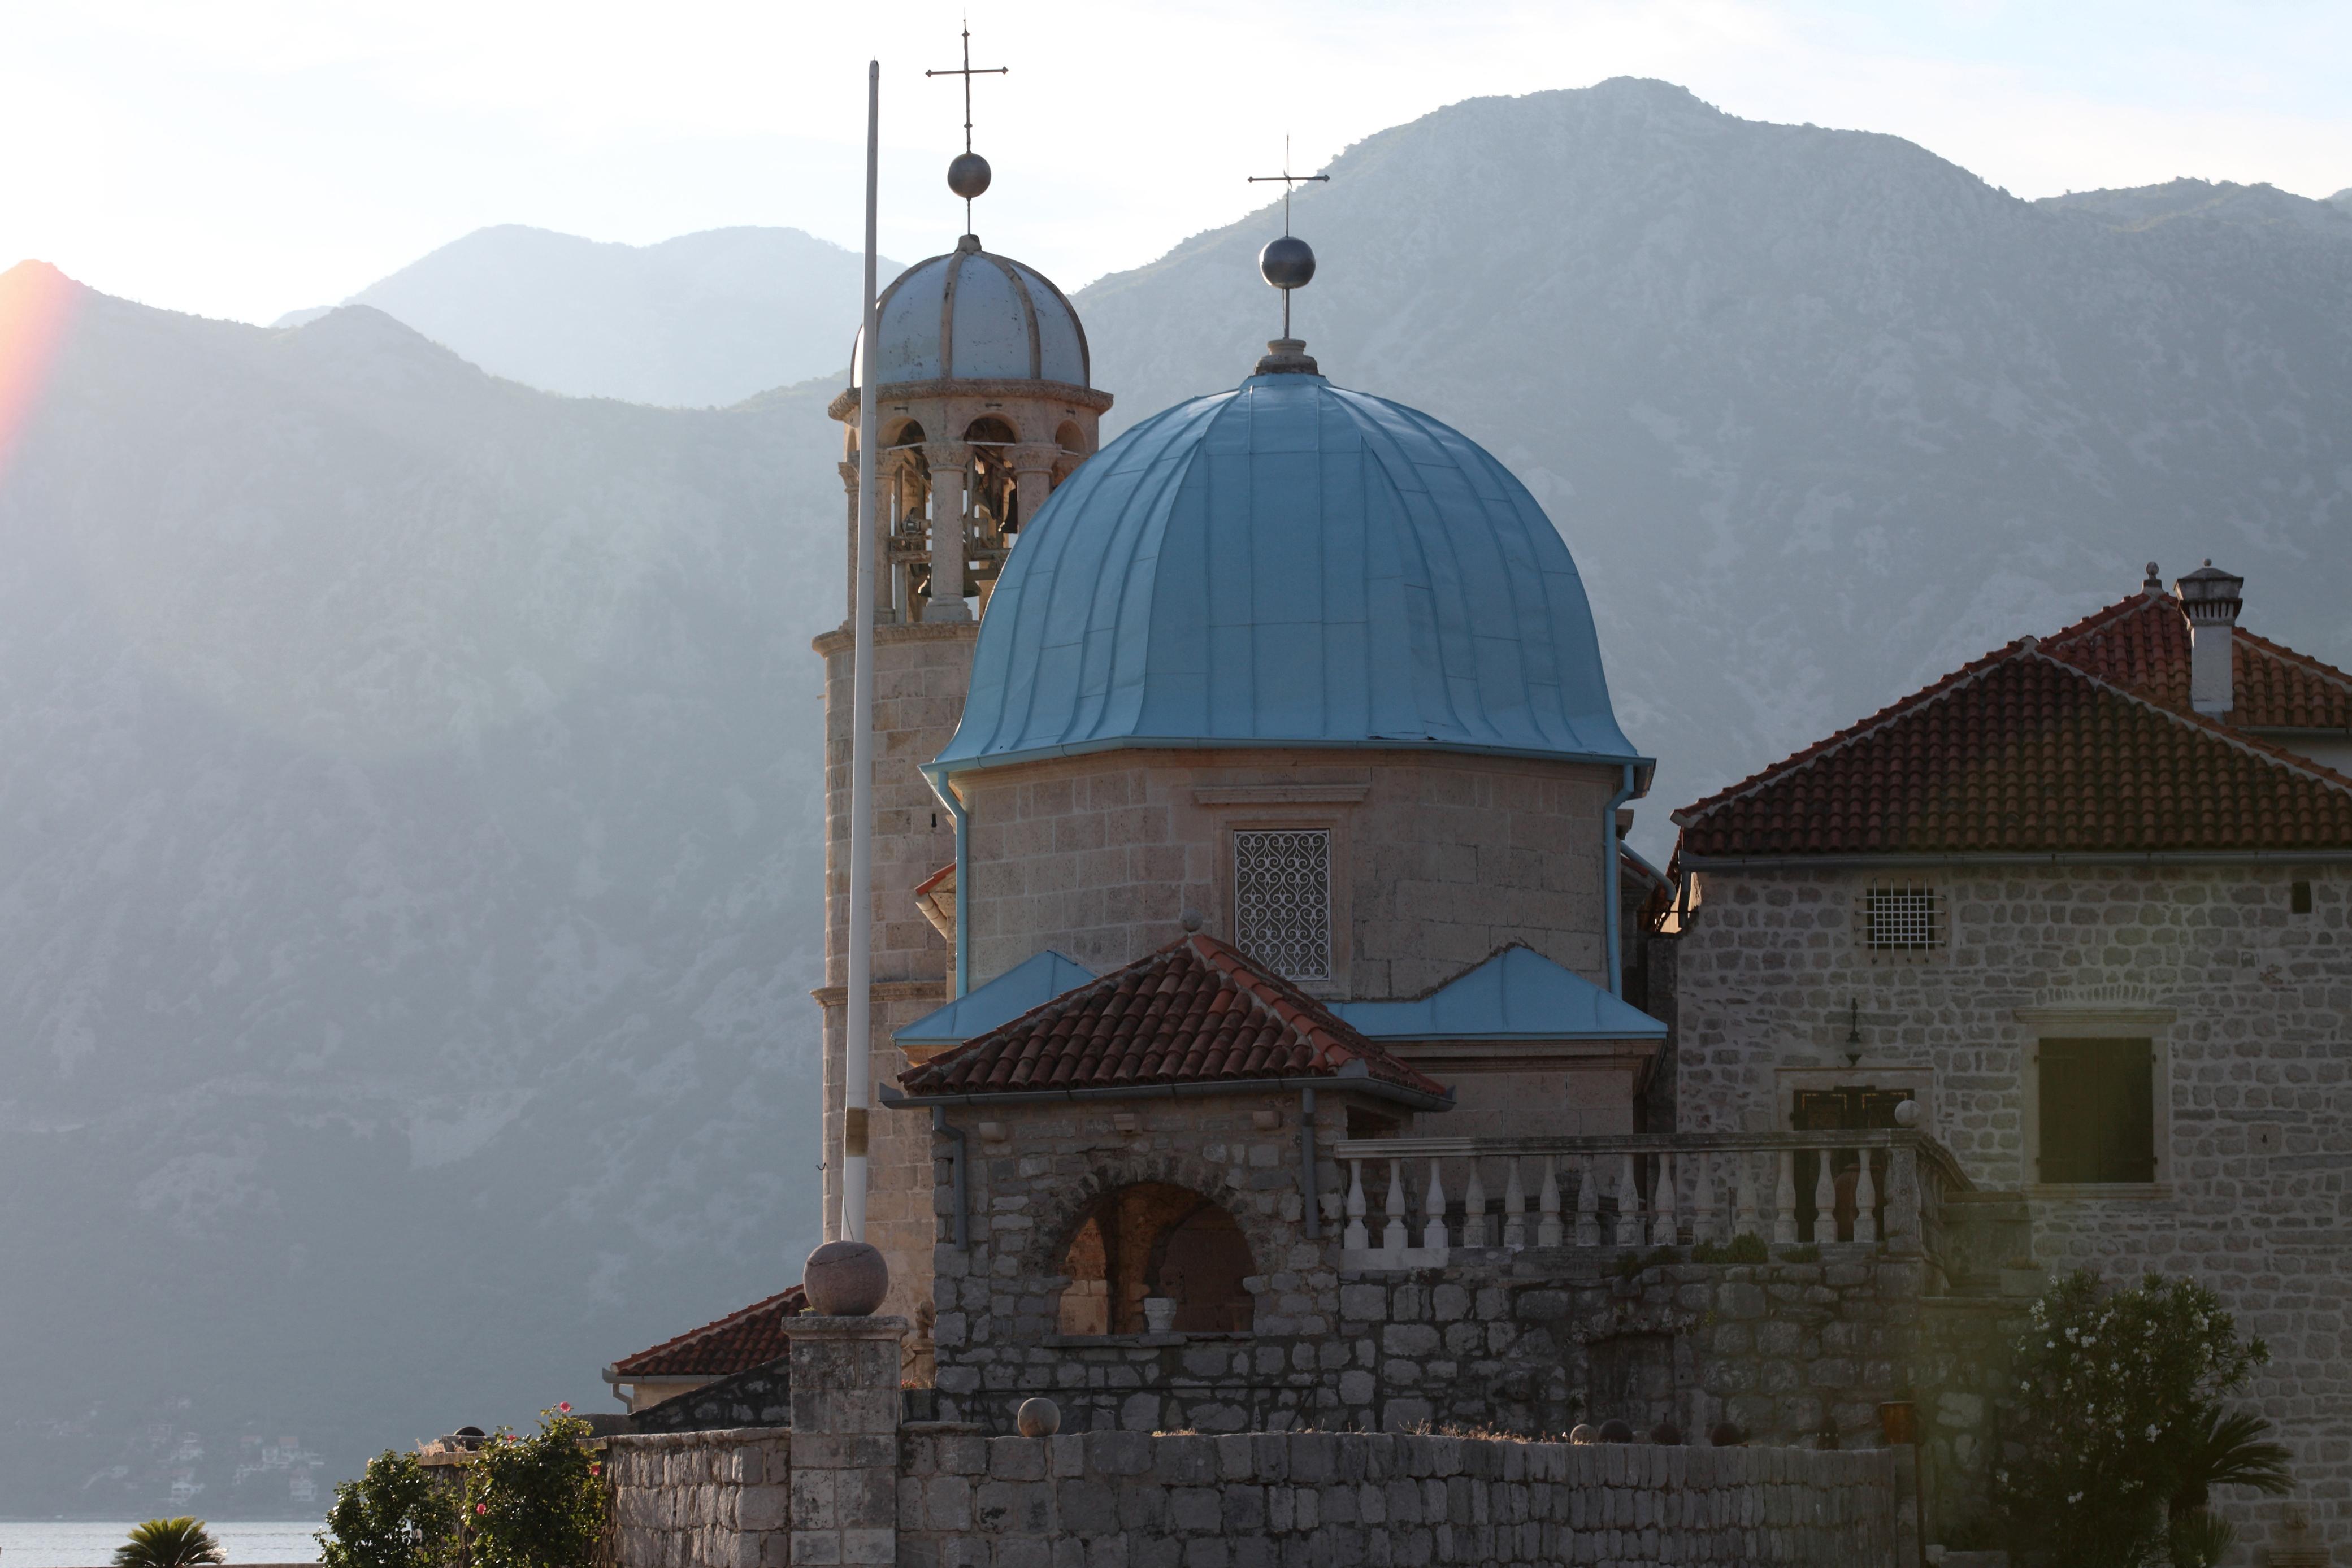 Descubre una iglesia en medio del fiordo - Croacia Circuito Croacia Total: de Zagreb a Dubrovnik